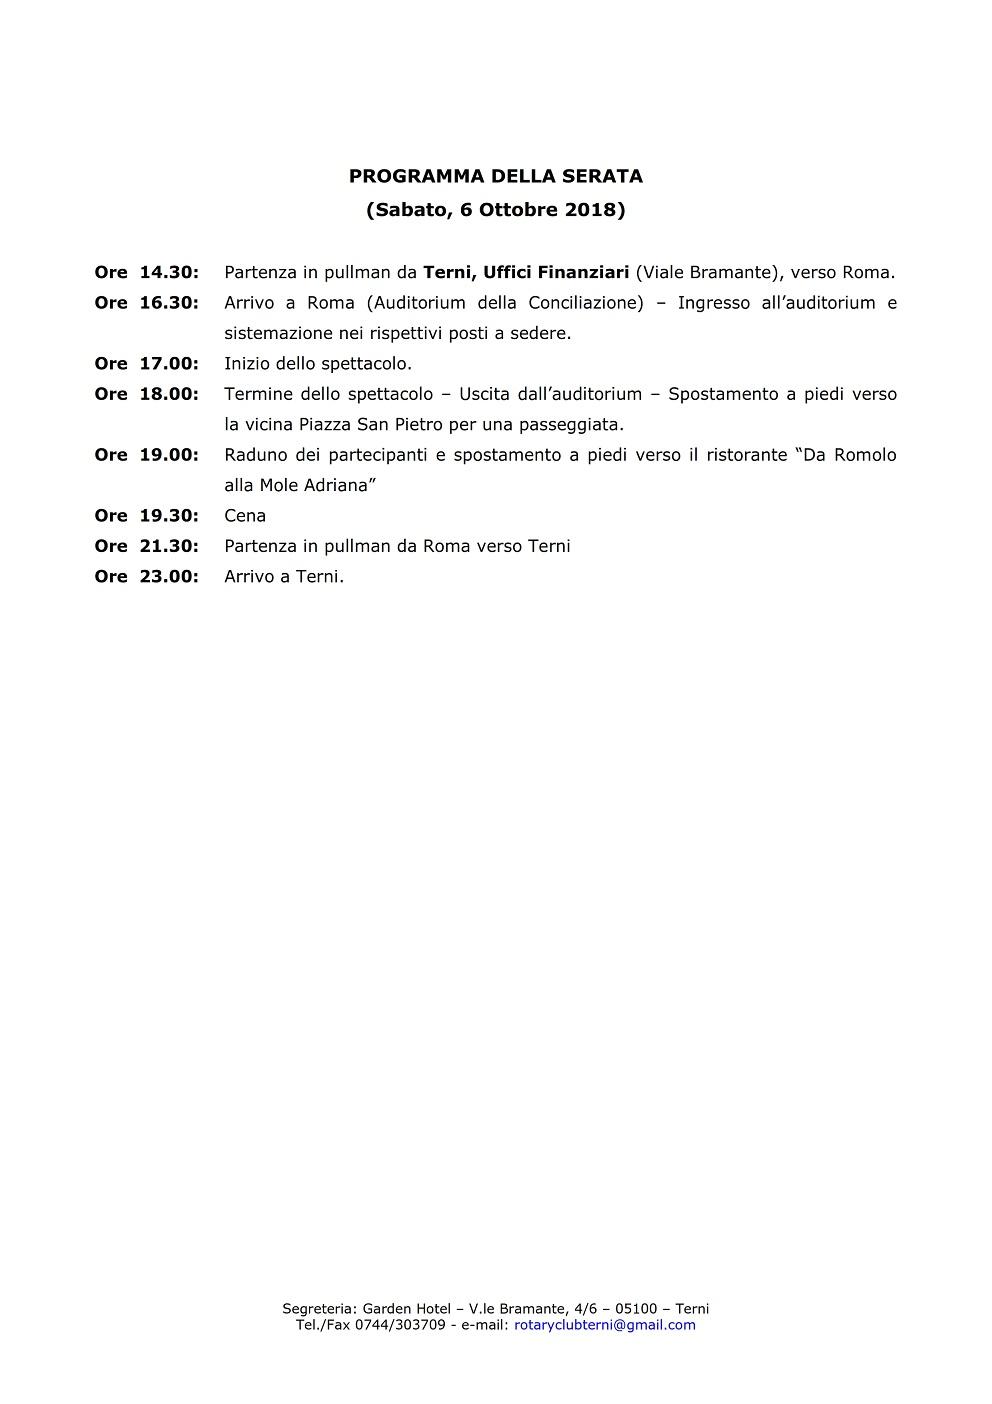 2018_10-RC Terni-Programma Ottobre 2018_004